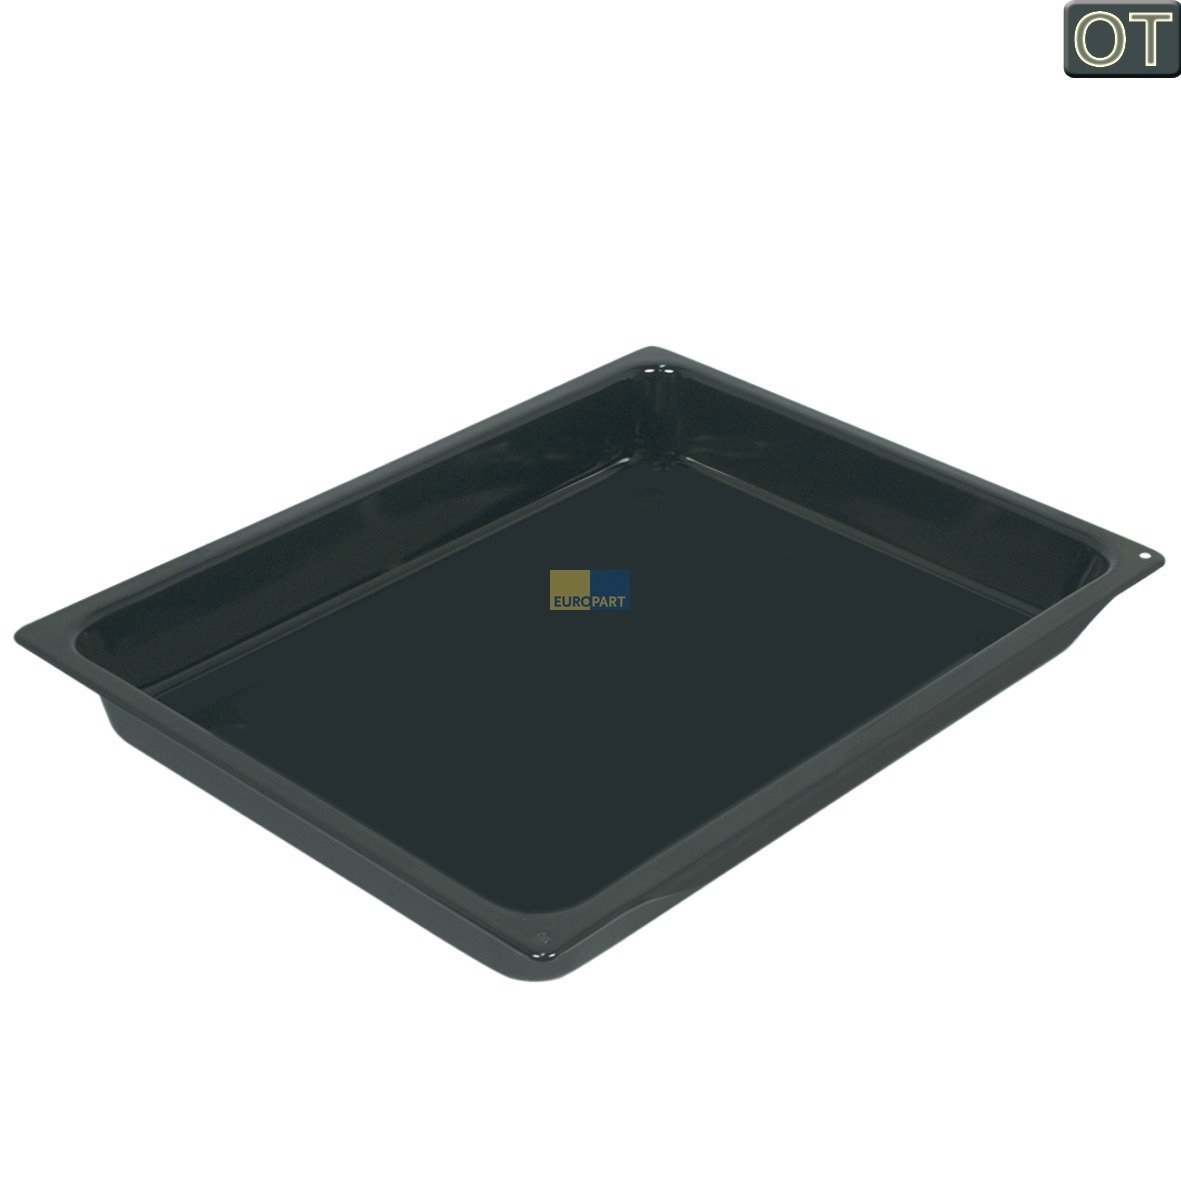 Gorenje esmaltada bandeja goteo Pan 45, 8 x 36 cm x 4, 5, 6 cm - Nº: 274663: Amazon.es: Hogar